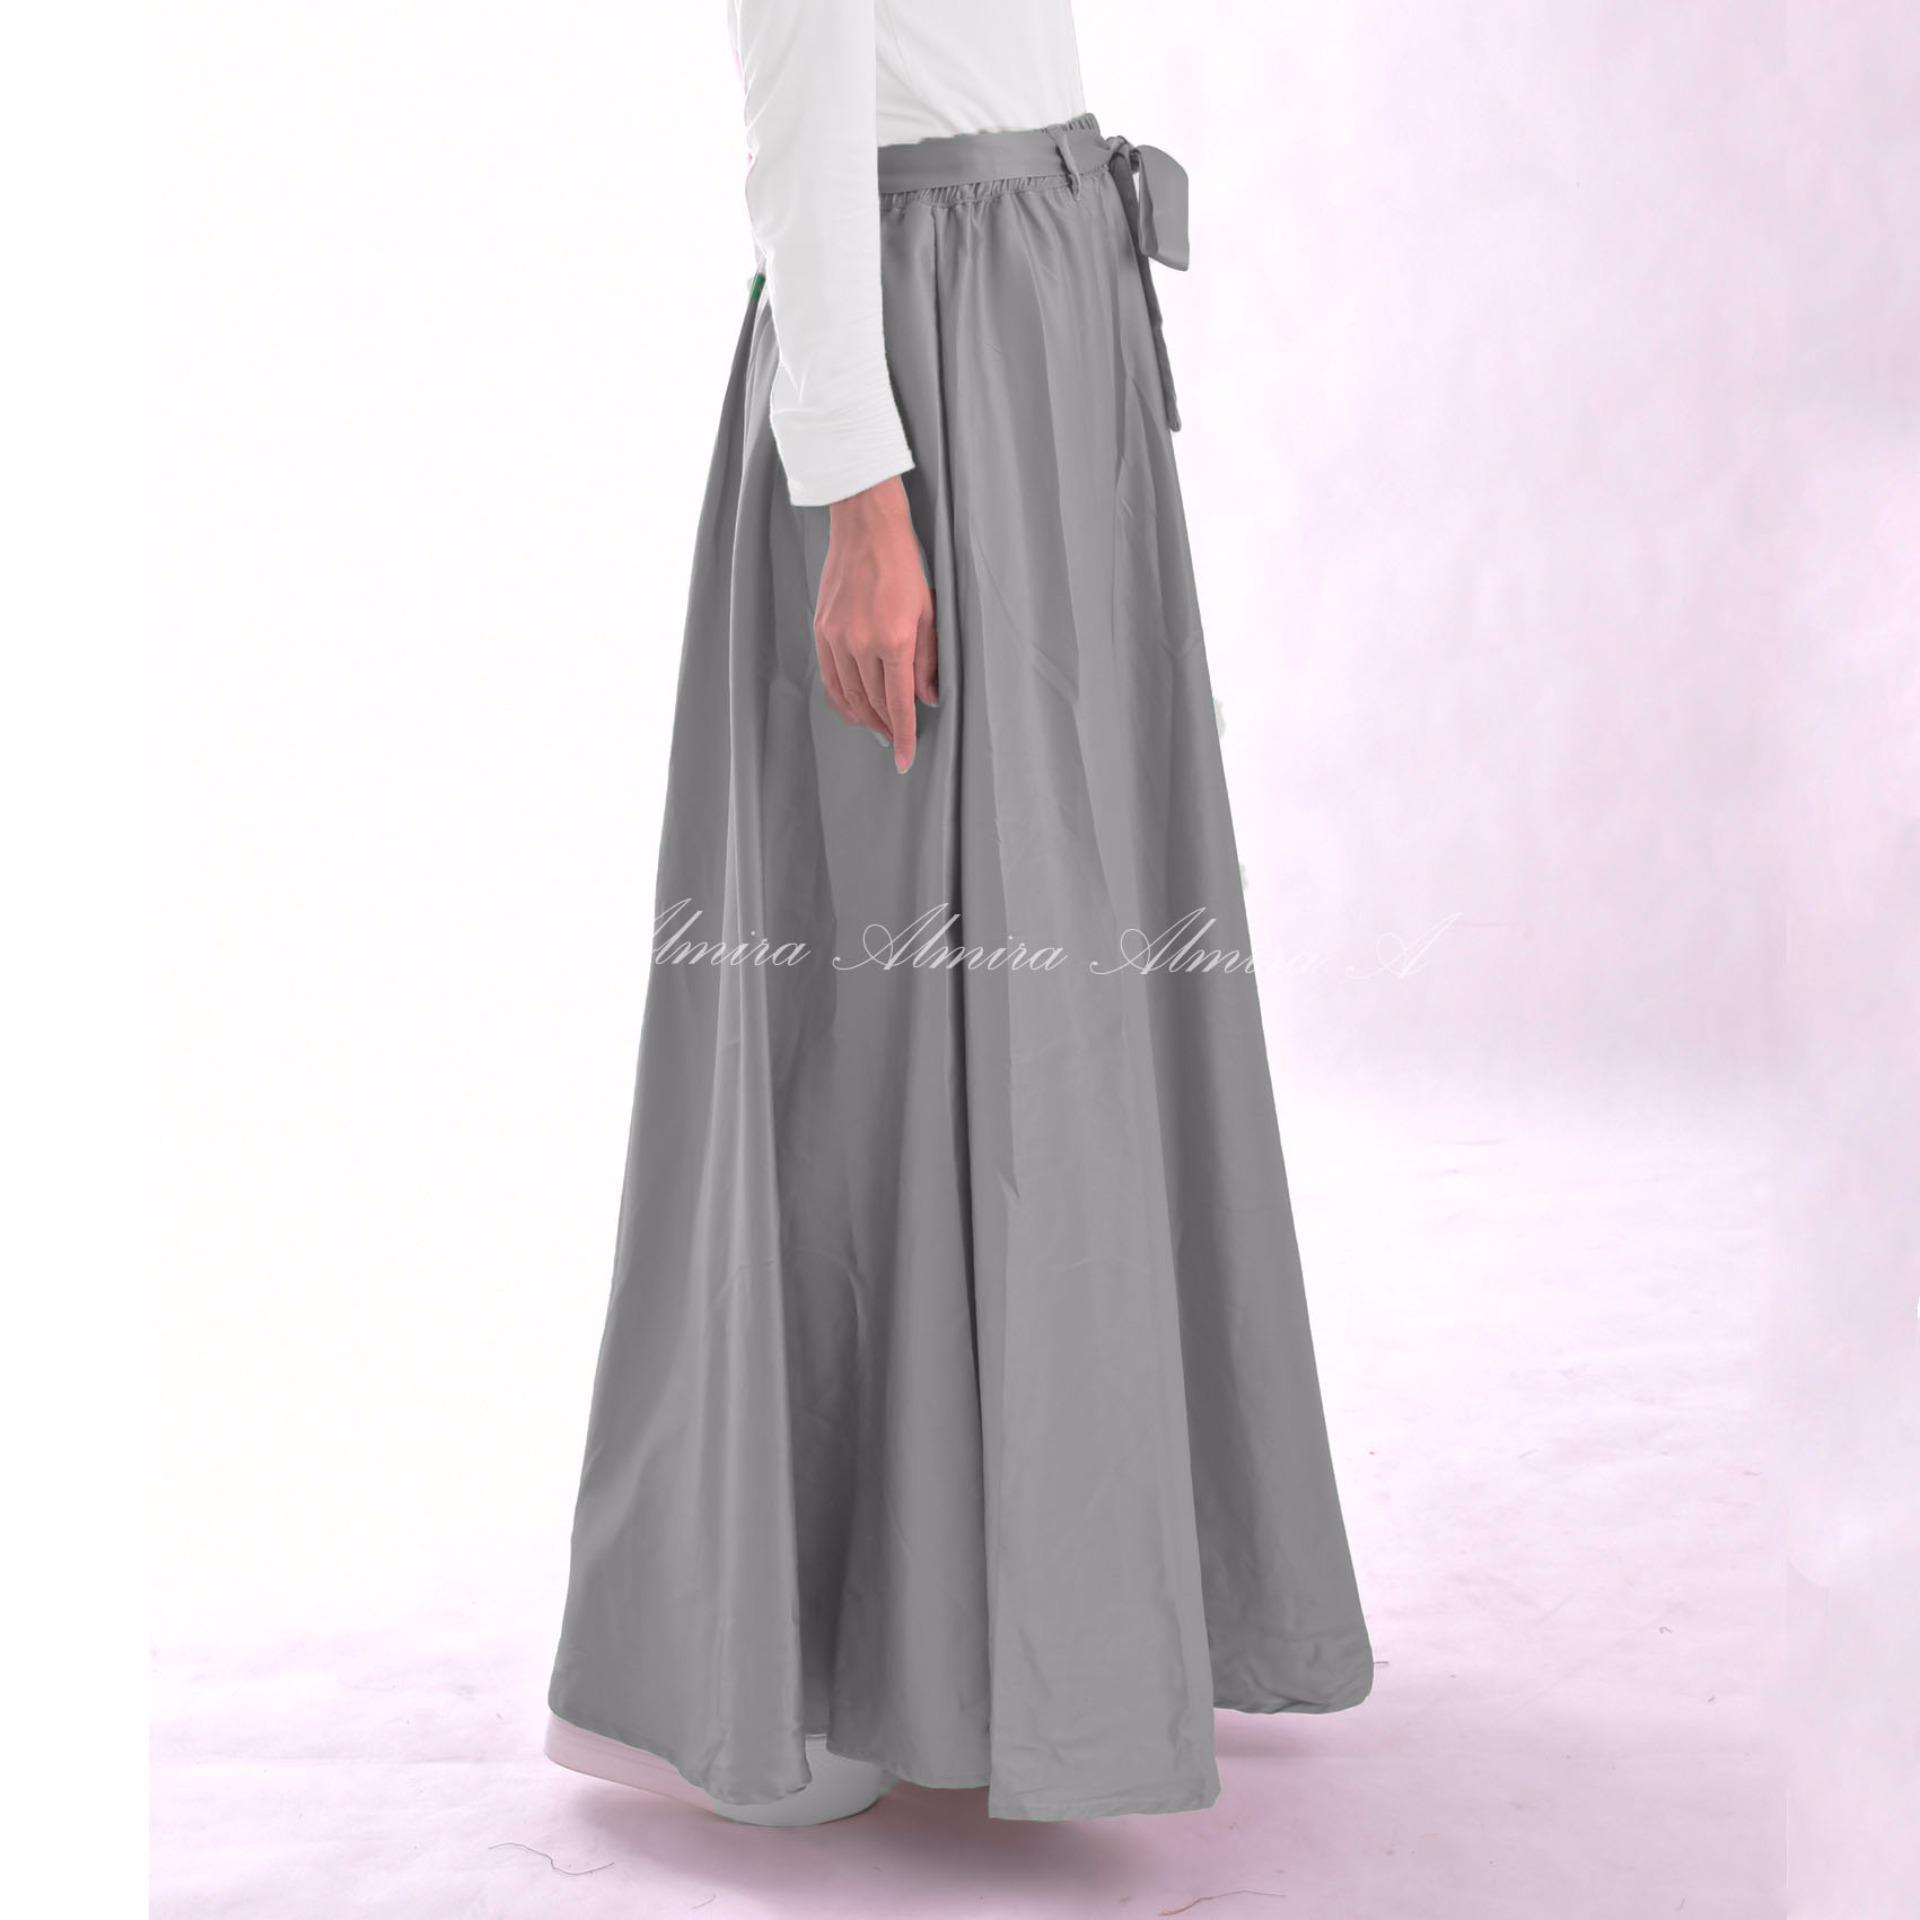 Almira Rok Panjang Wanita Velvet Abu ...